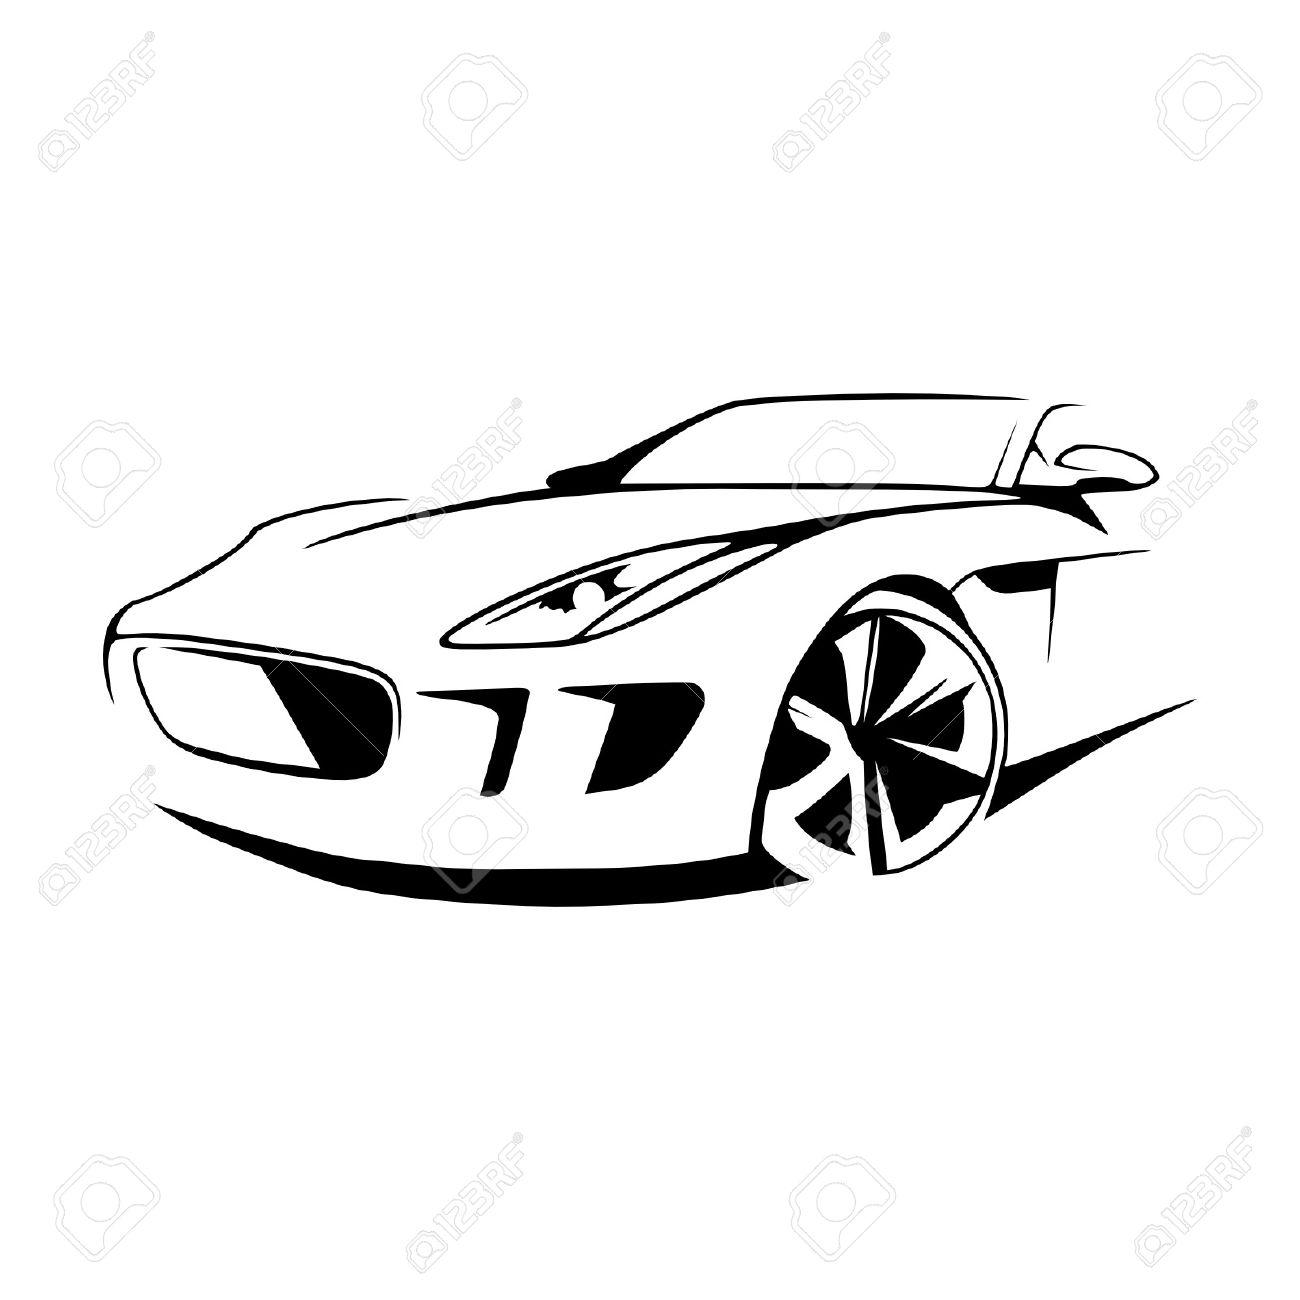 Sports Car Silhouette Vector.